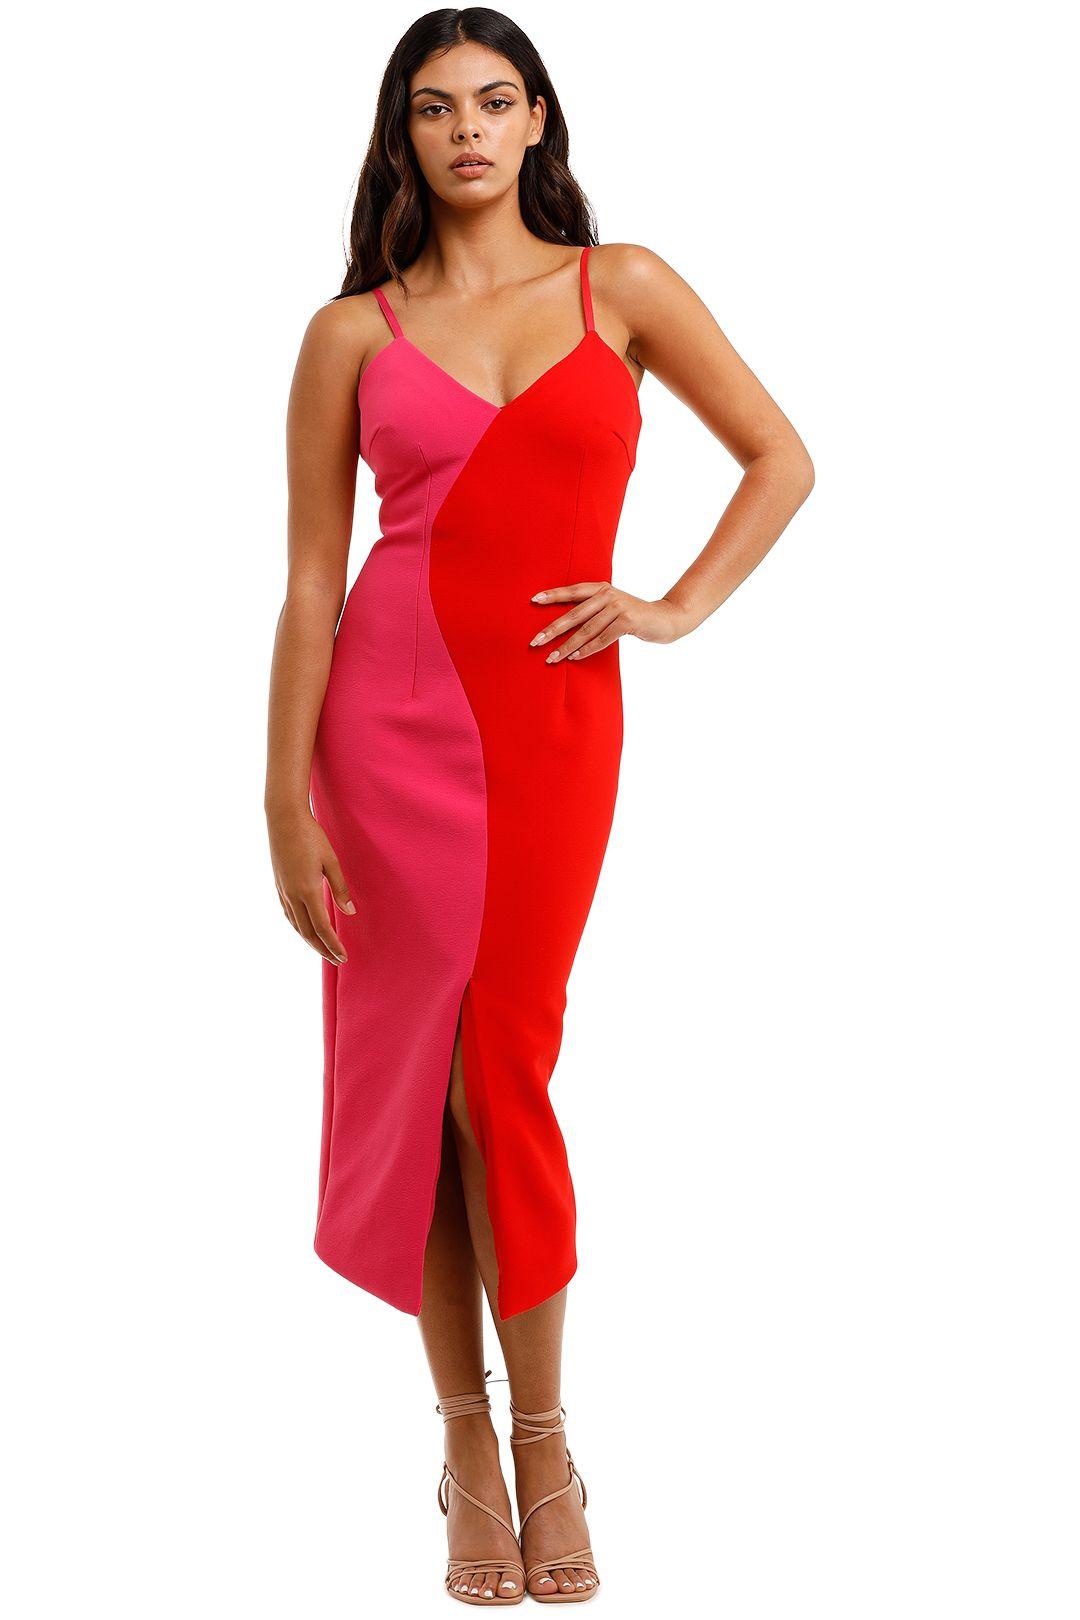 Elliatt Sydne Dress Fuschia bodycon